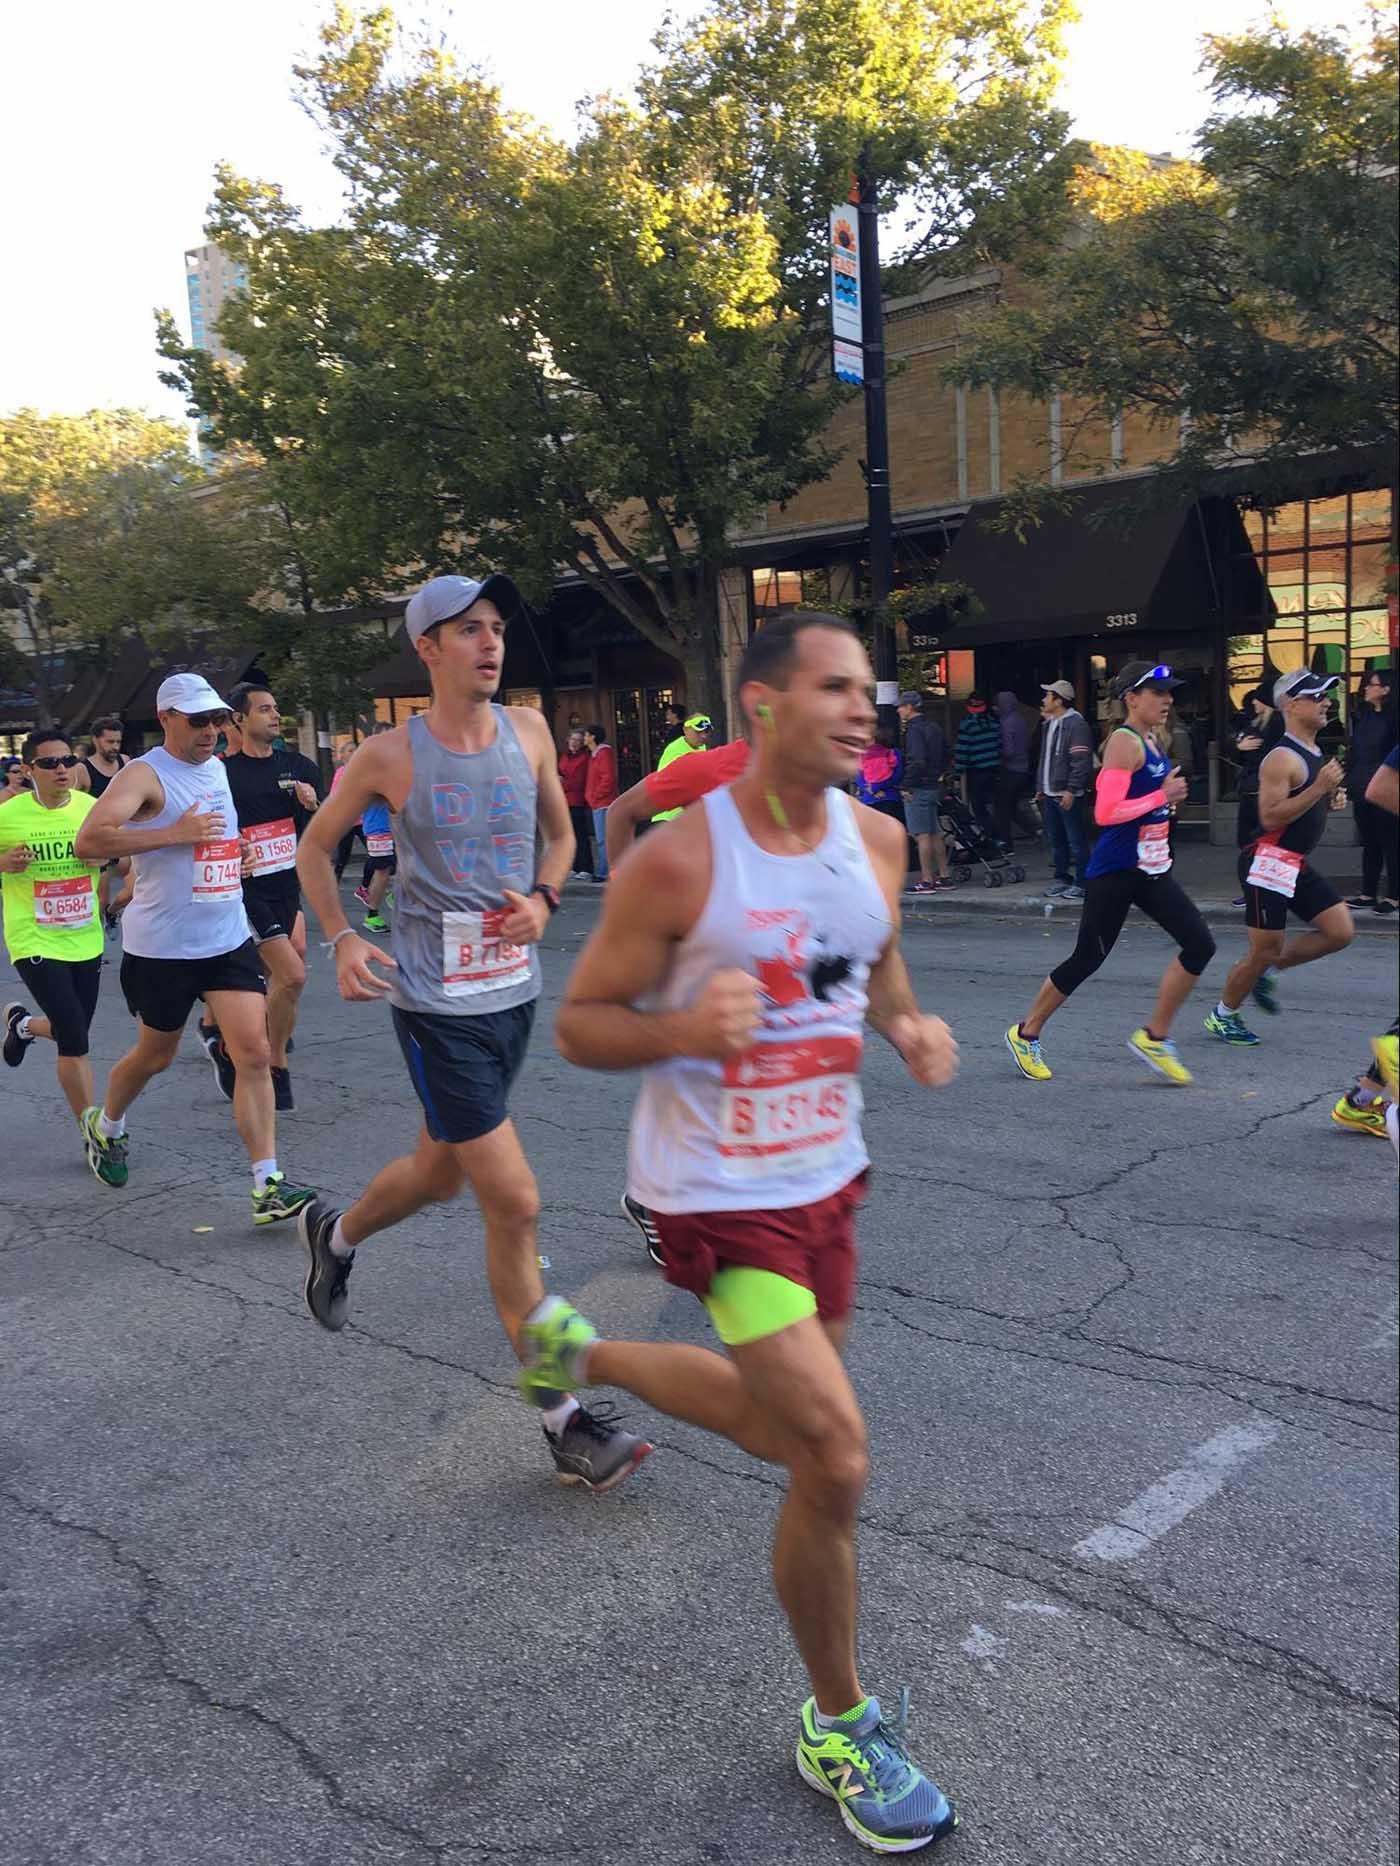 asweatlife_chicago-marathoners-honor-a-fallen-friend_2